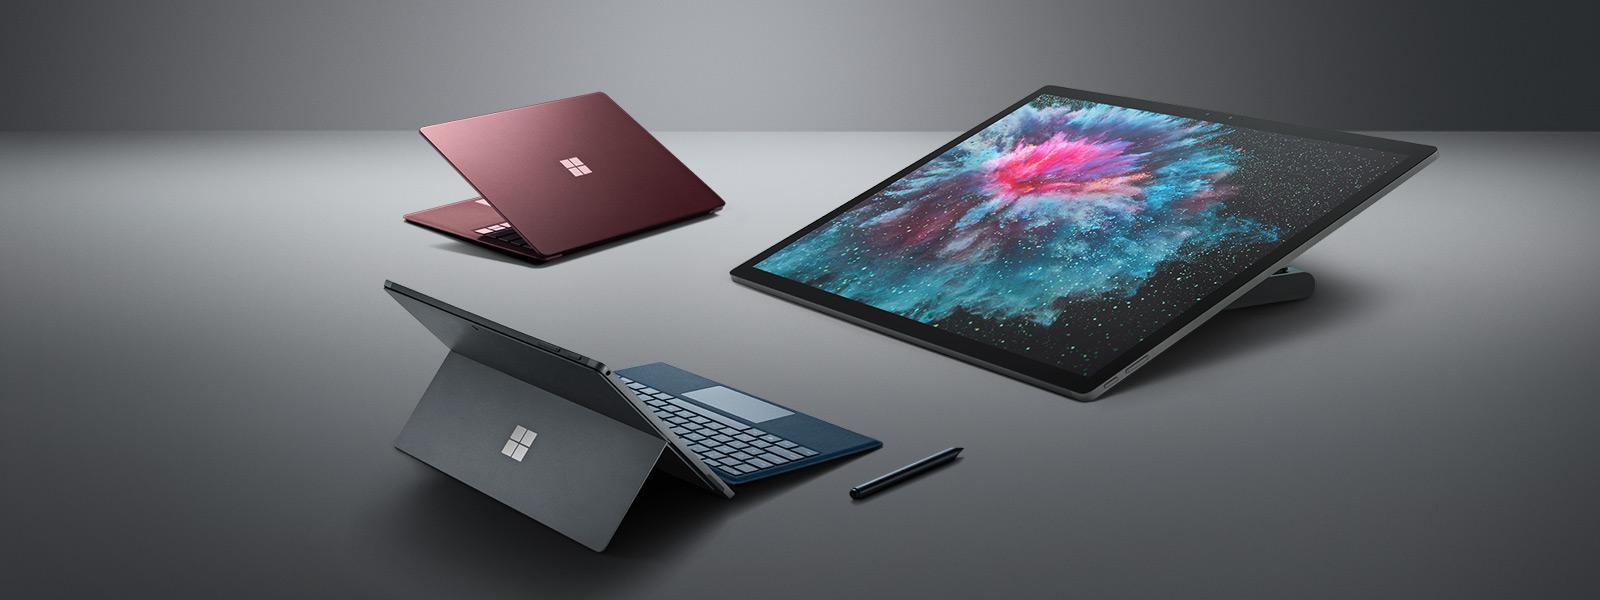 Surface Pro 6, Surface Laptop 2, Surface Studio 2